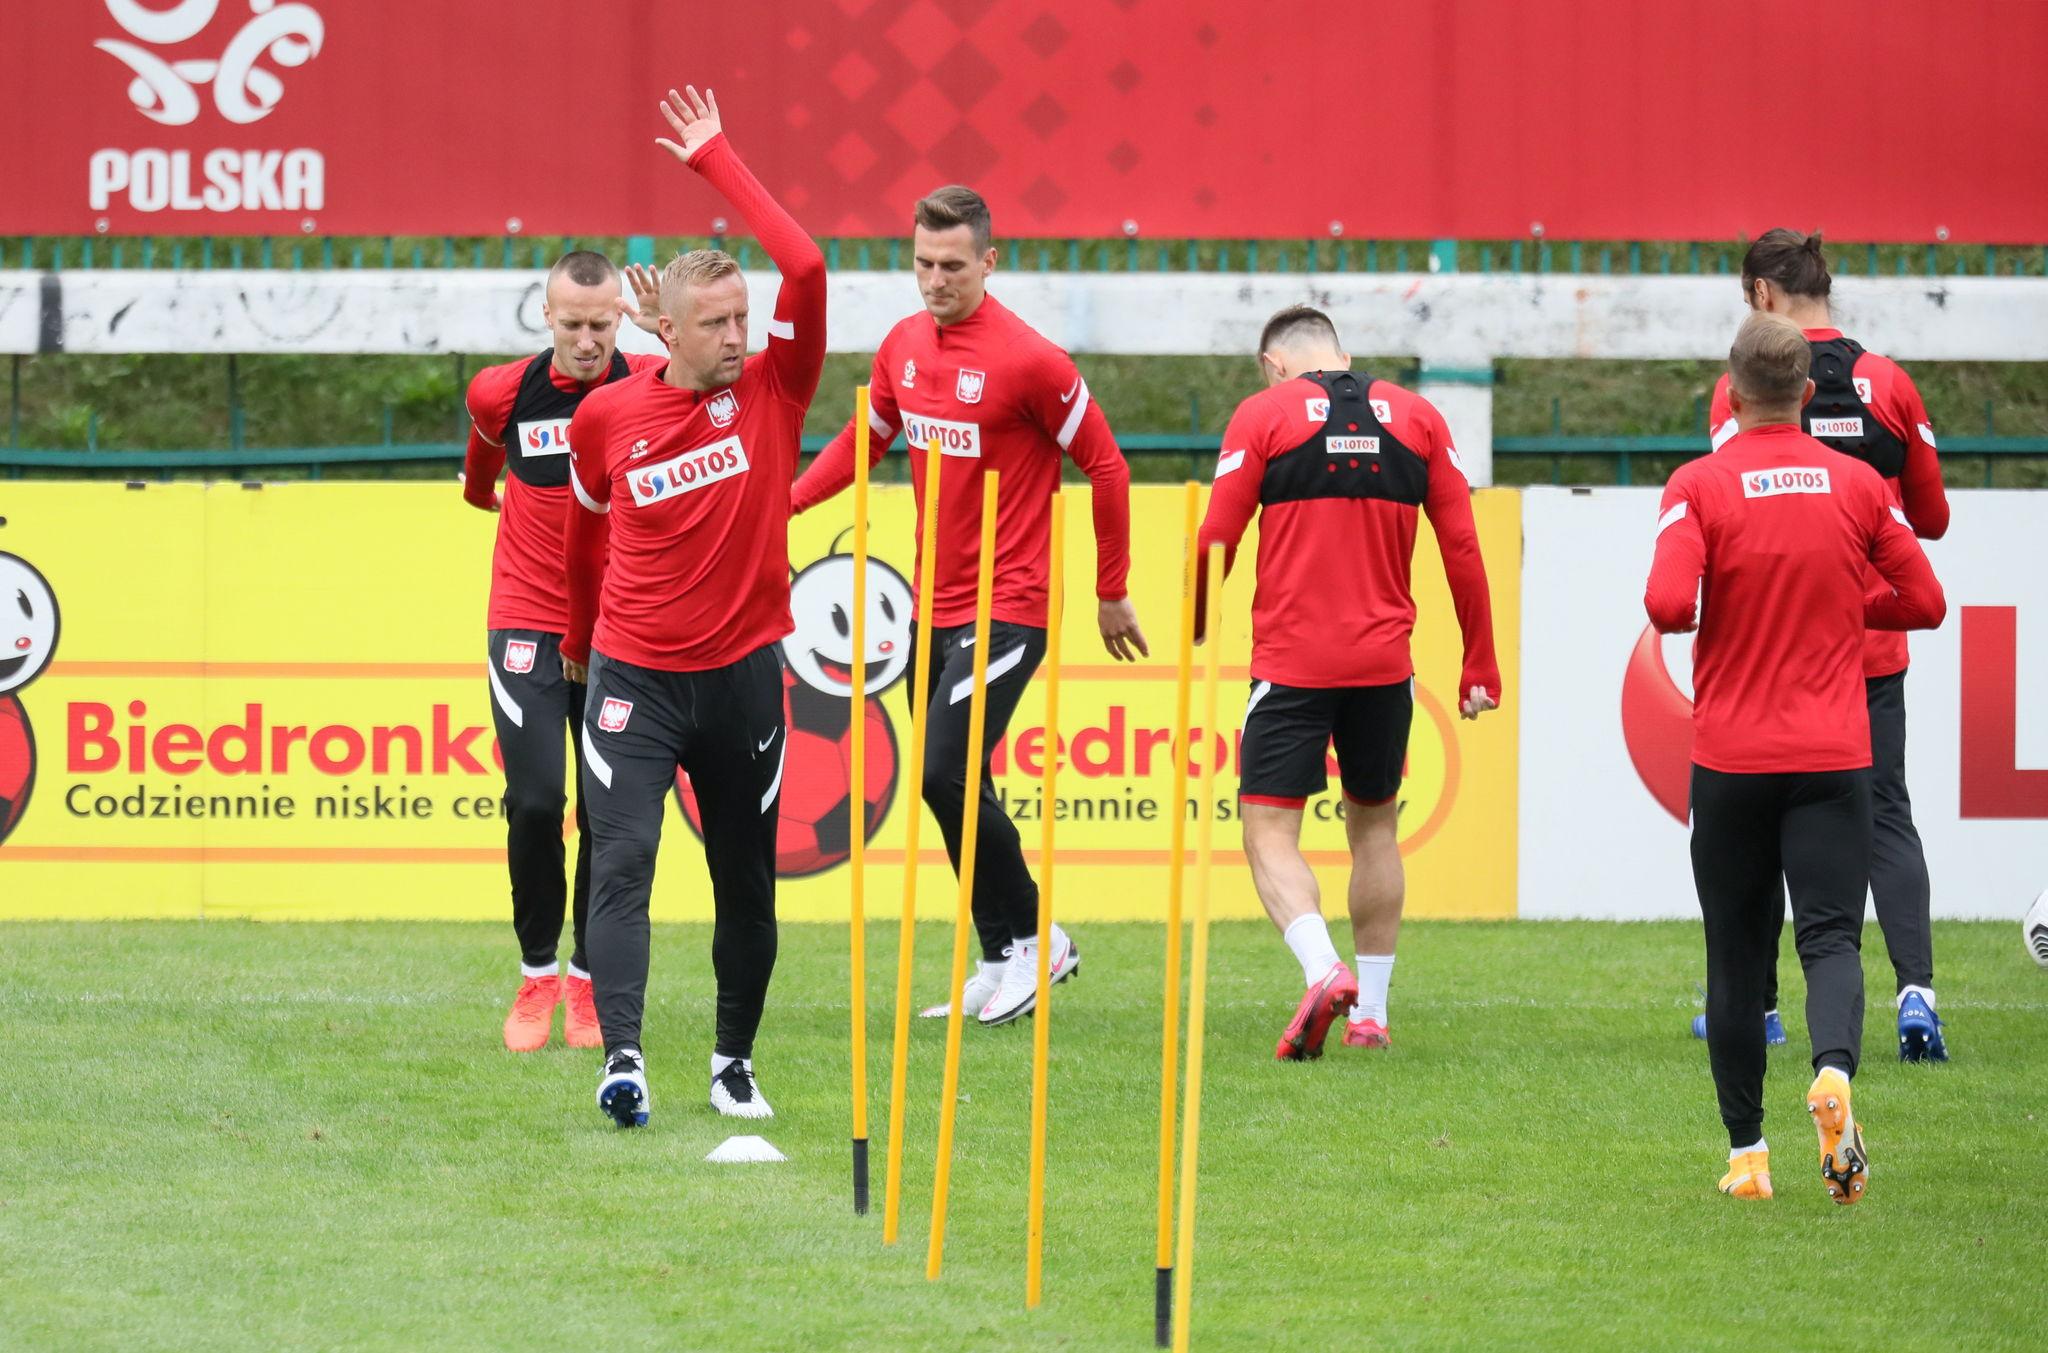 Warsaw (Poland), 02/09/2020.- Polish national soccer team player Kamil Glik (L) warm-up during their team's training session in Warsaw, Poland, 02 September 2020. Poland will face Netherlands in their UEFA lt;HIT gt;Nations lt;/HIT gt; lt;HIT gt;League lt;/HIT gt; soccer match on 04 September in Amsterdam. (Países Bajos; Holanda, Polonia, Varsovia) EFE/EPA/LESZEK SZYMANSKI POLAND OUT